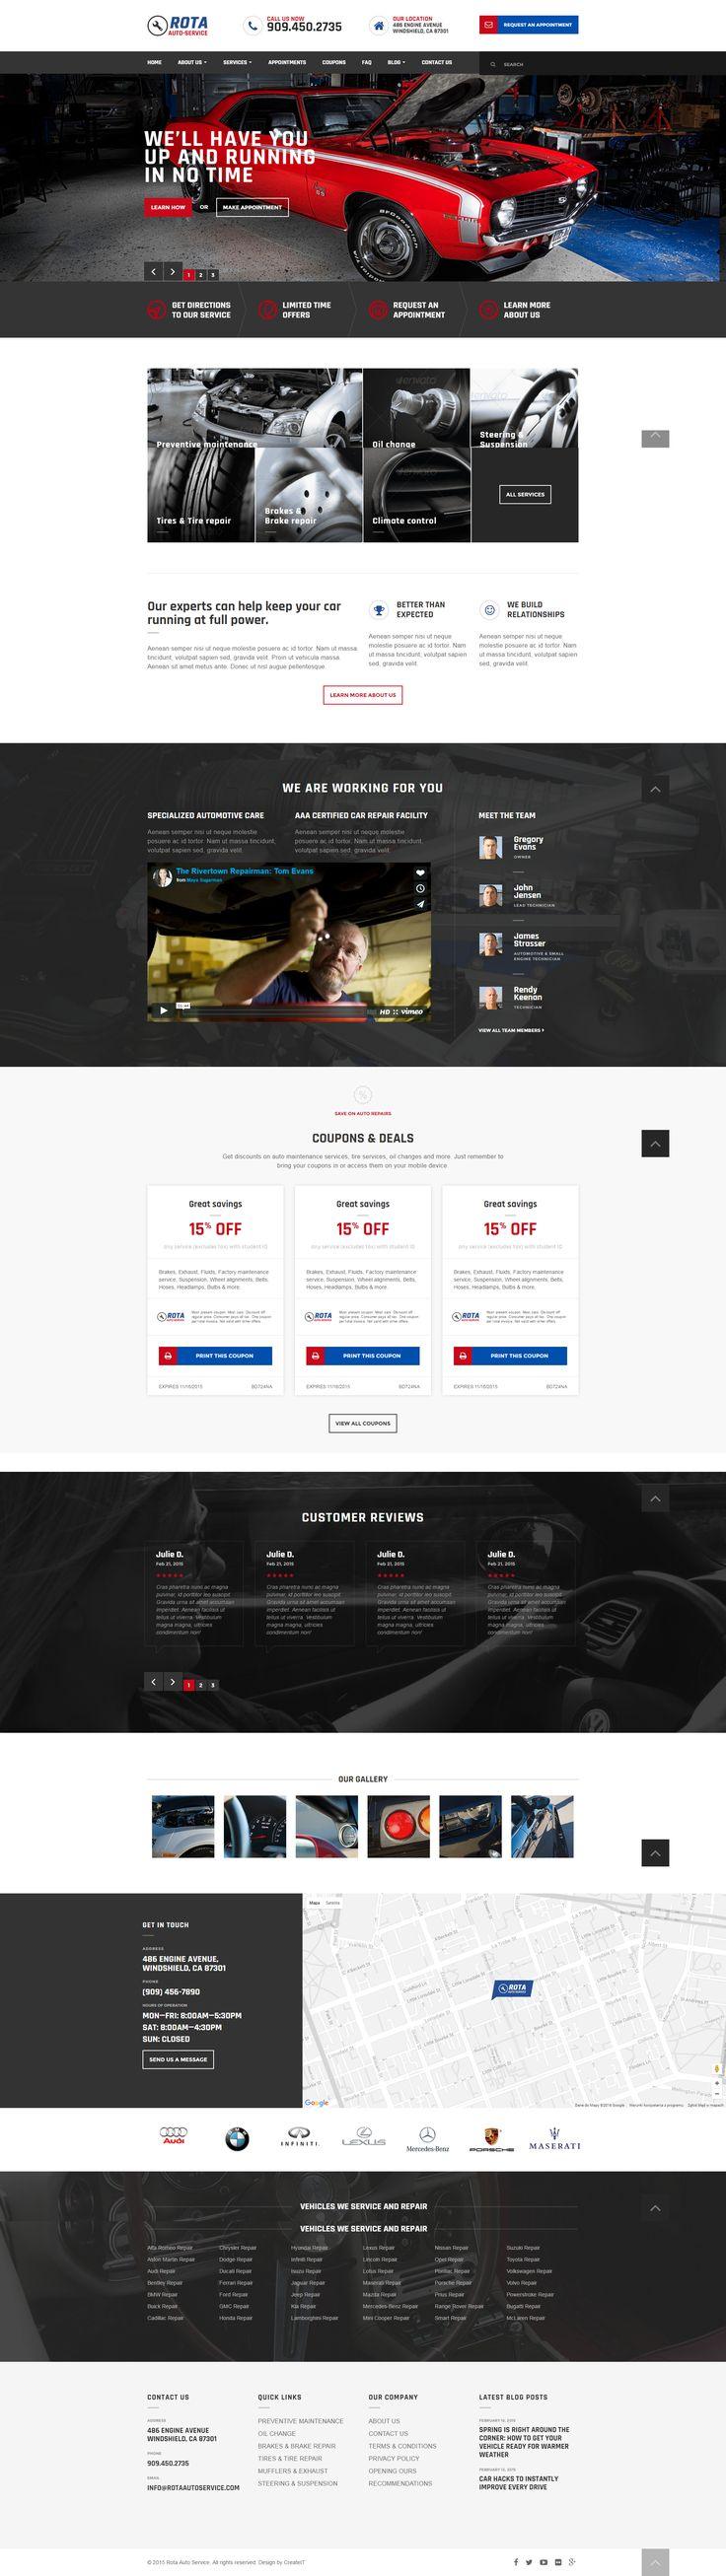 Rota Auto Service - Mechanic Workshop HTML5 Template #site #car #mechanician • Download ➝ https://themeforest.net/item/rota-auto-service-mechanic-workshop-html5-template/15412011?ref=pxcr